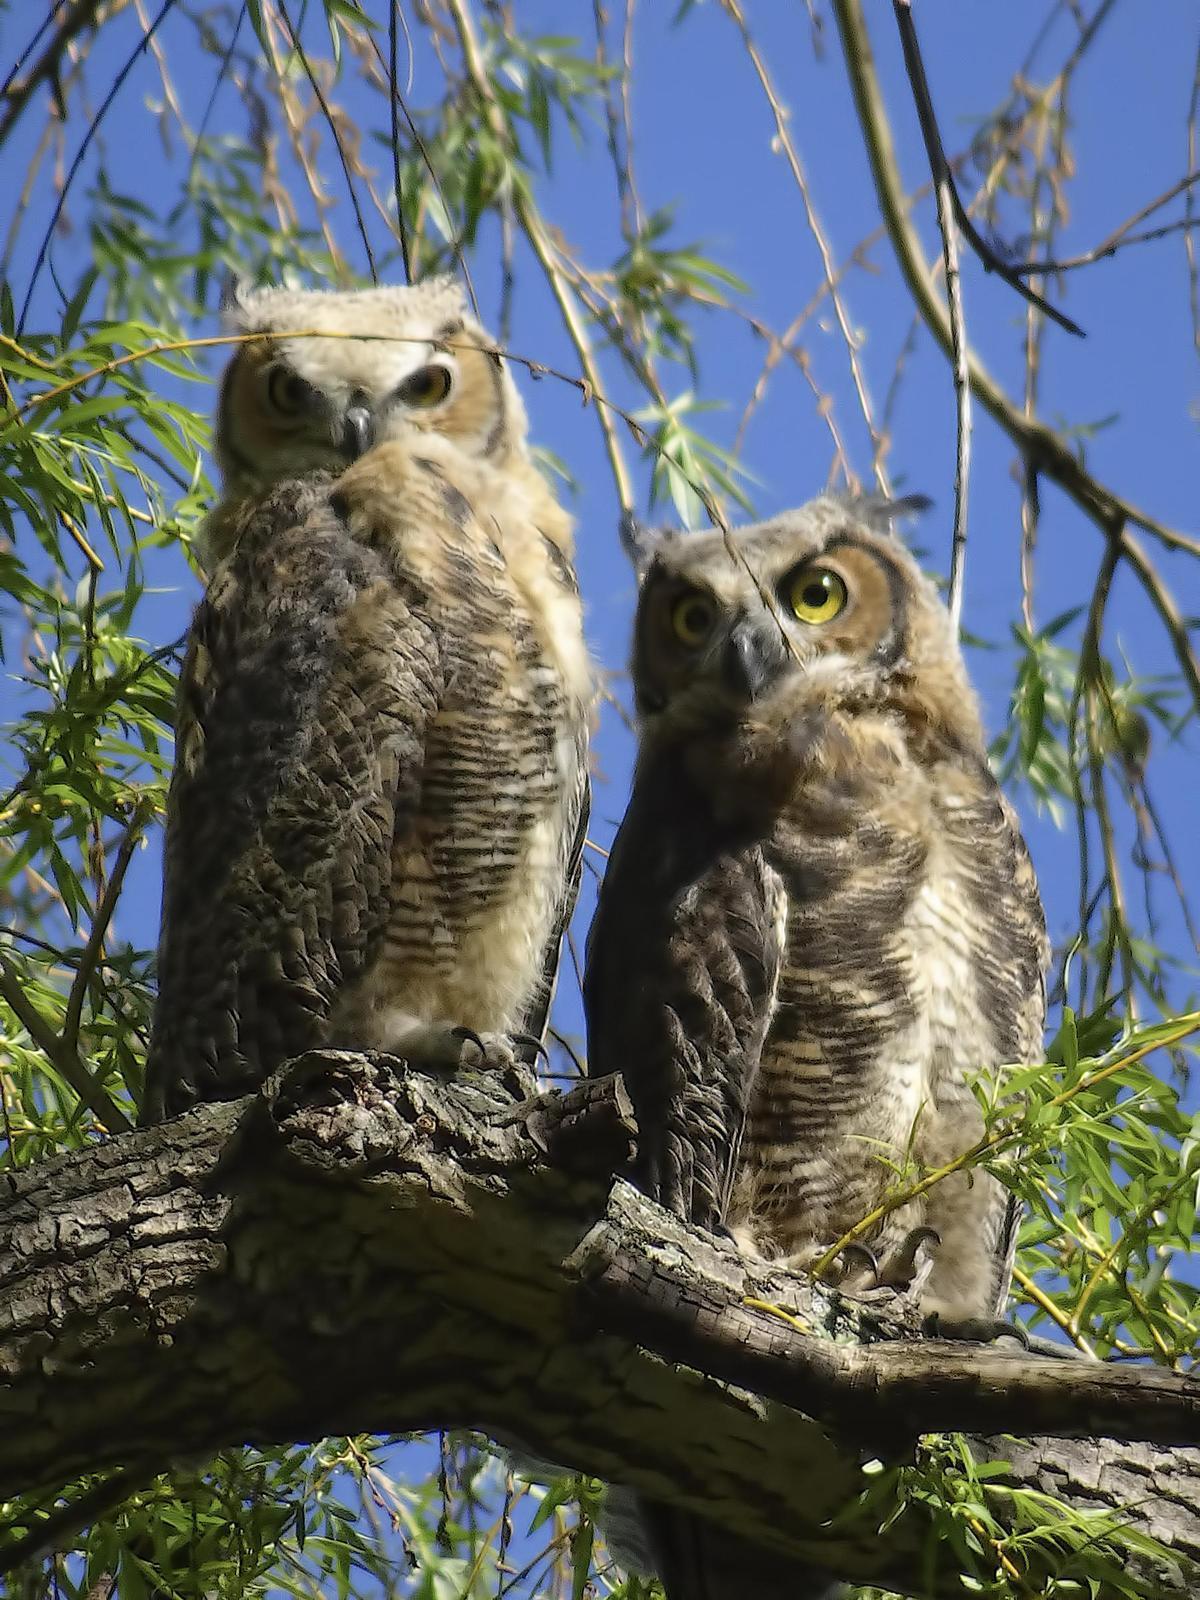 Great Horned Owl Photo by Dan Tallman